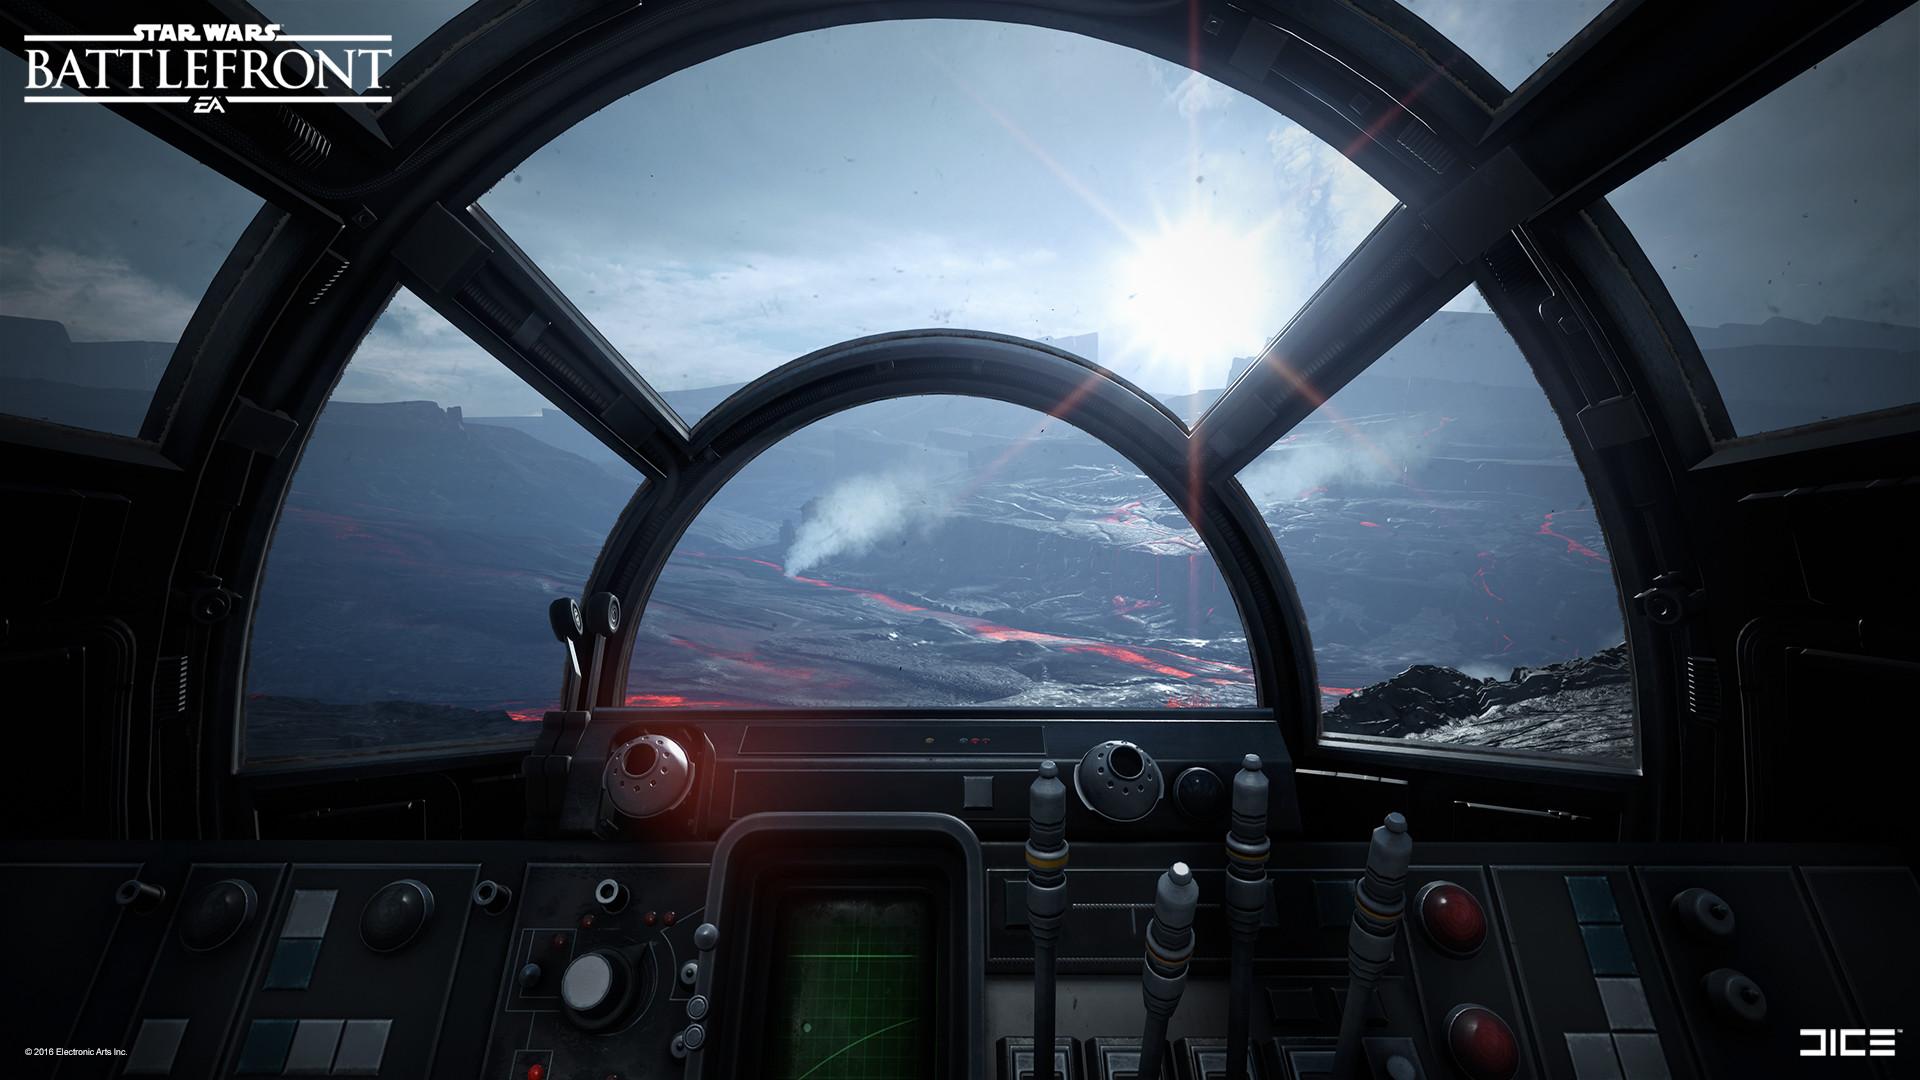 Artstation 2015 Star Wars Battlefront Vehicle Cockpit Interiors Carl Palacios